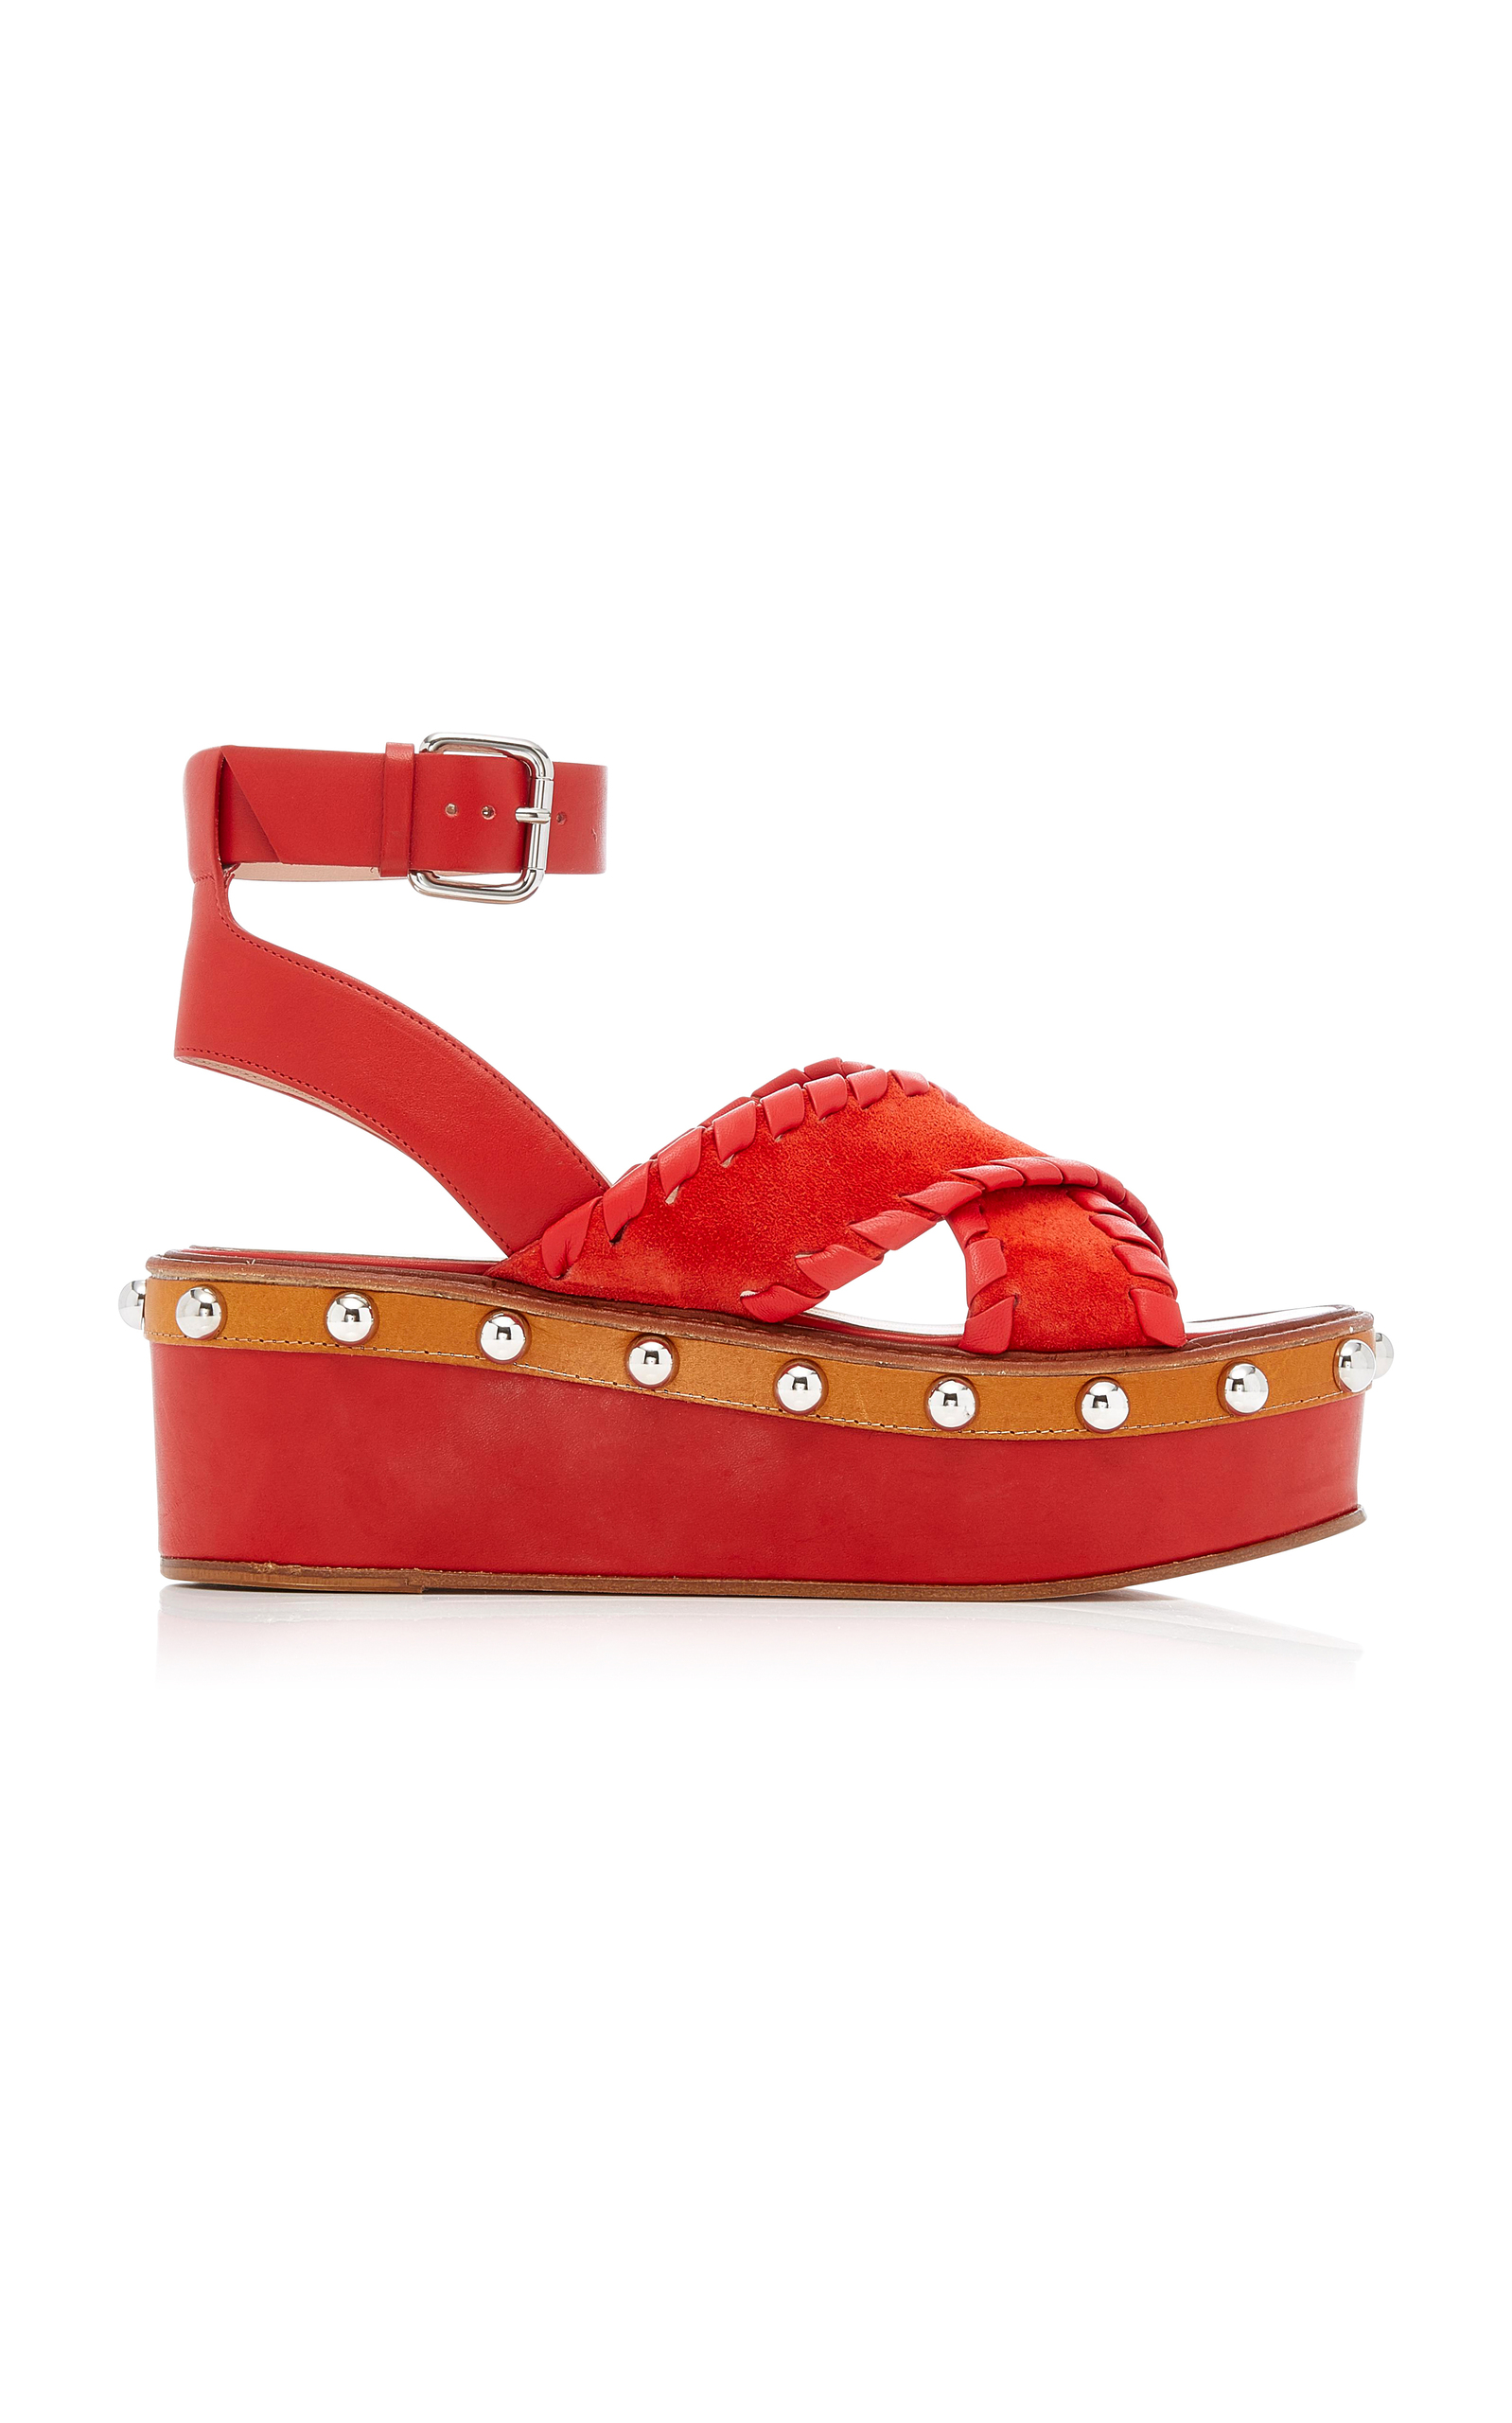 bacaccf4c632 Red ValentinoStudded Platform Sandal. CLOSE. Loading